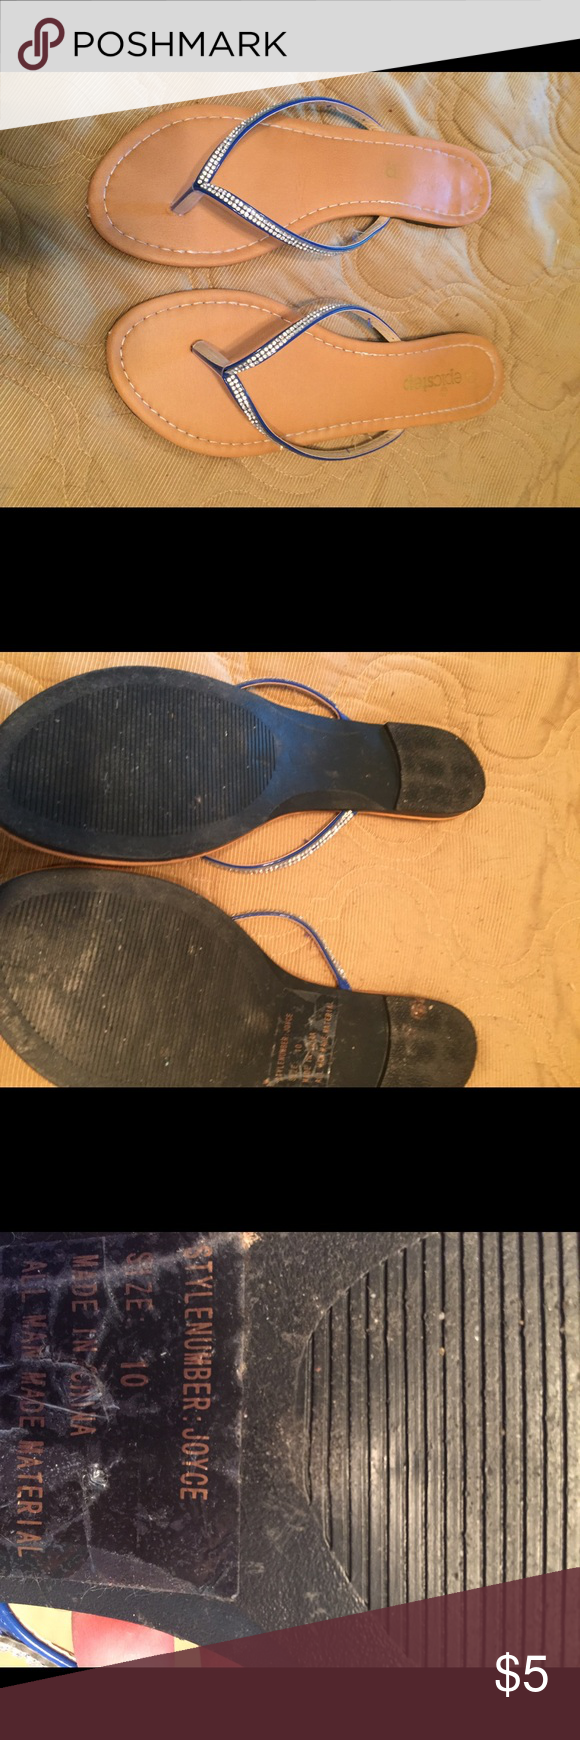 Bling blue flippers Super cute Shoes Sandals